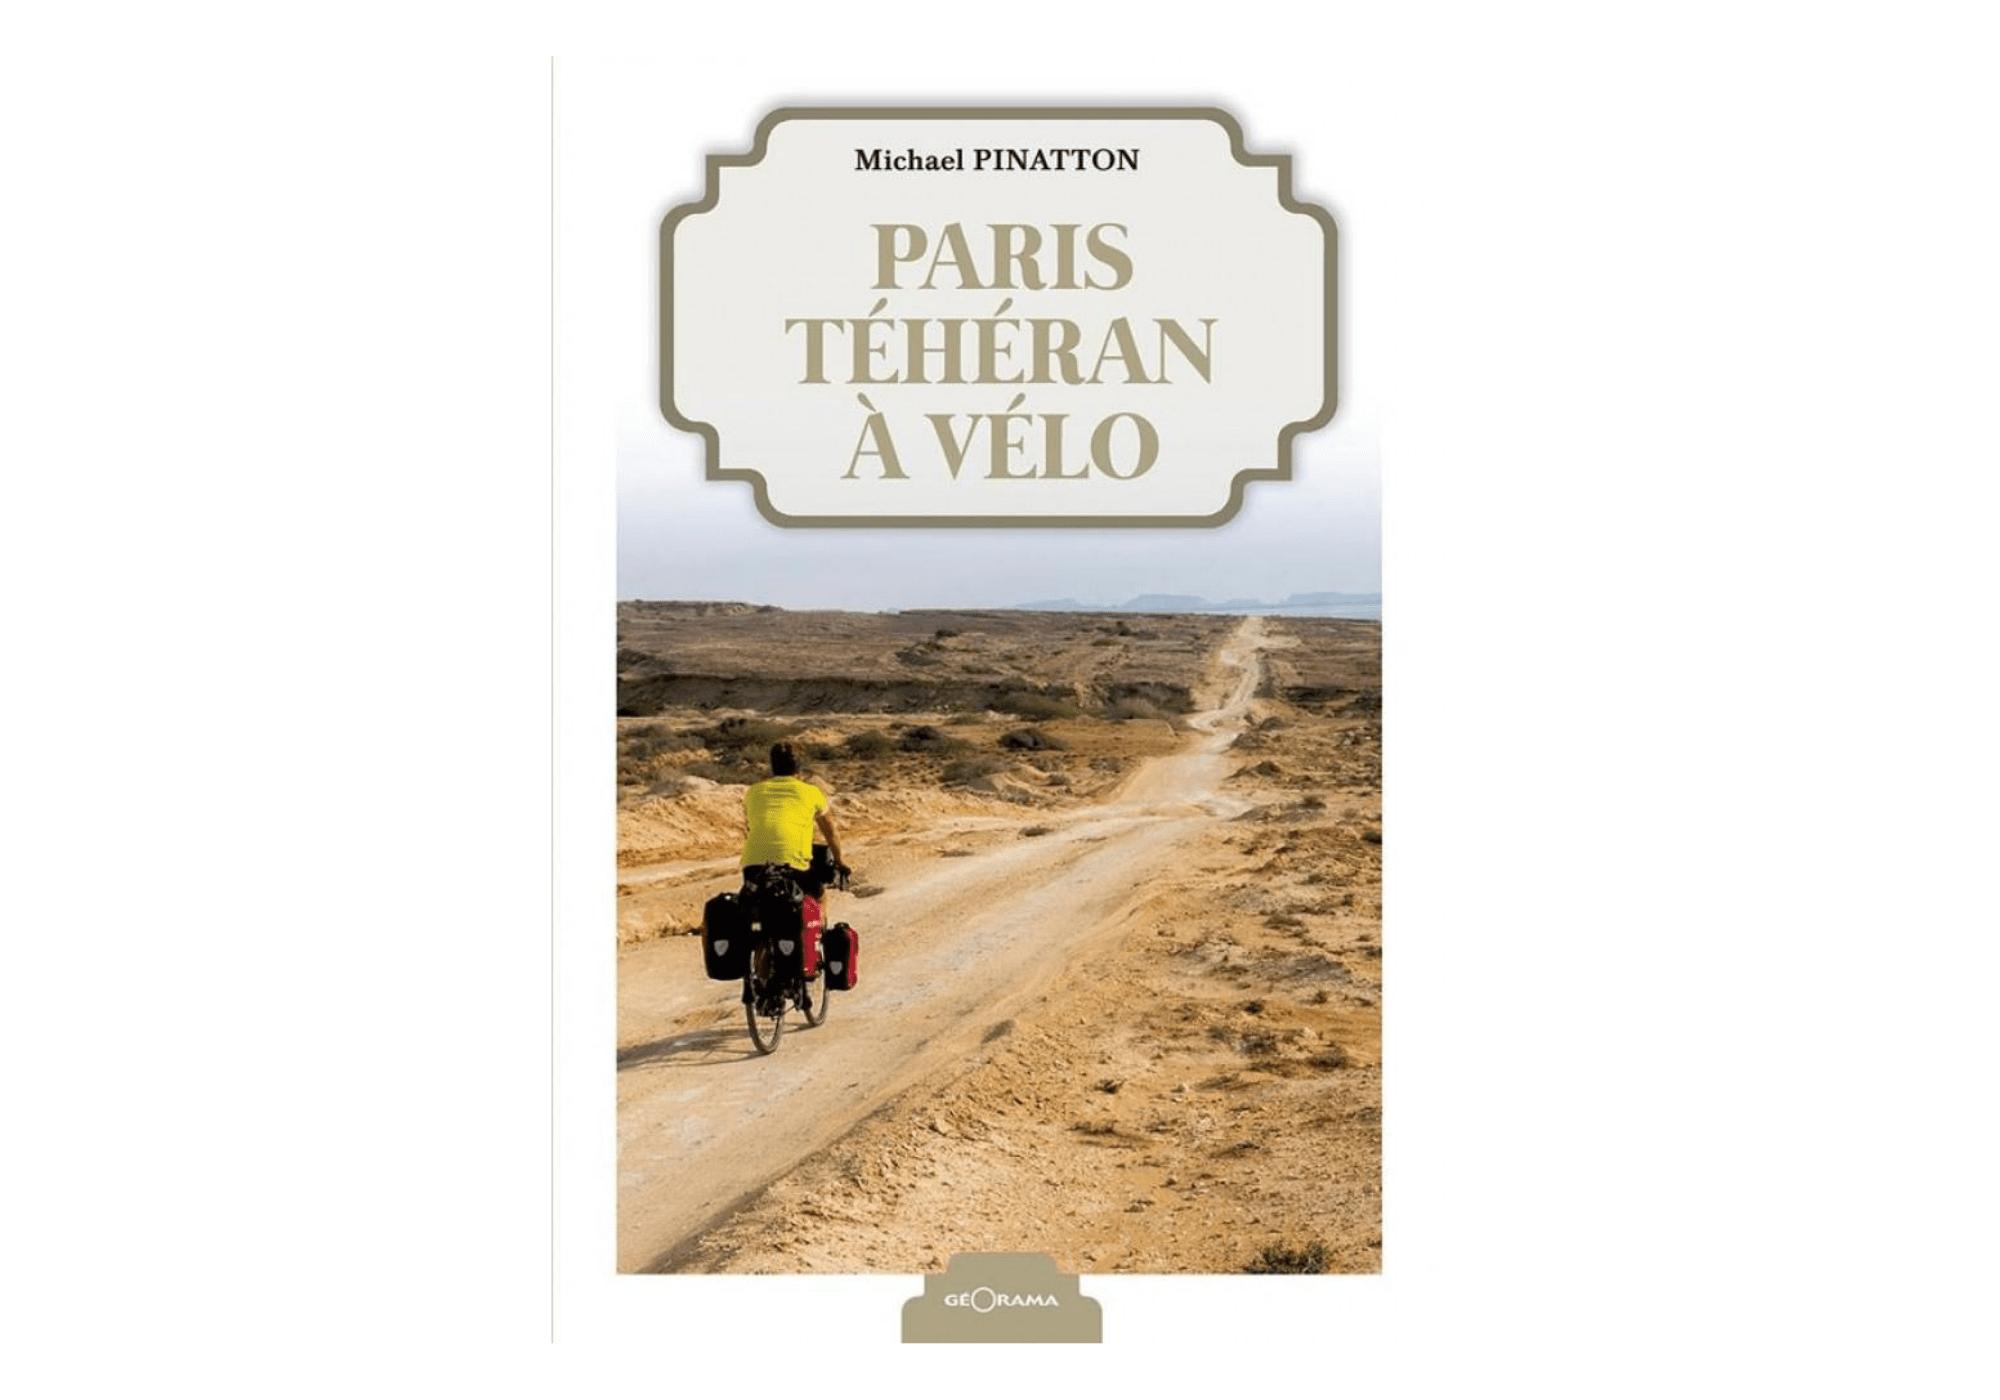 livres-de-voyage-michael-pinatton-paris-teheran-a-velo-blog-madame-voyage